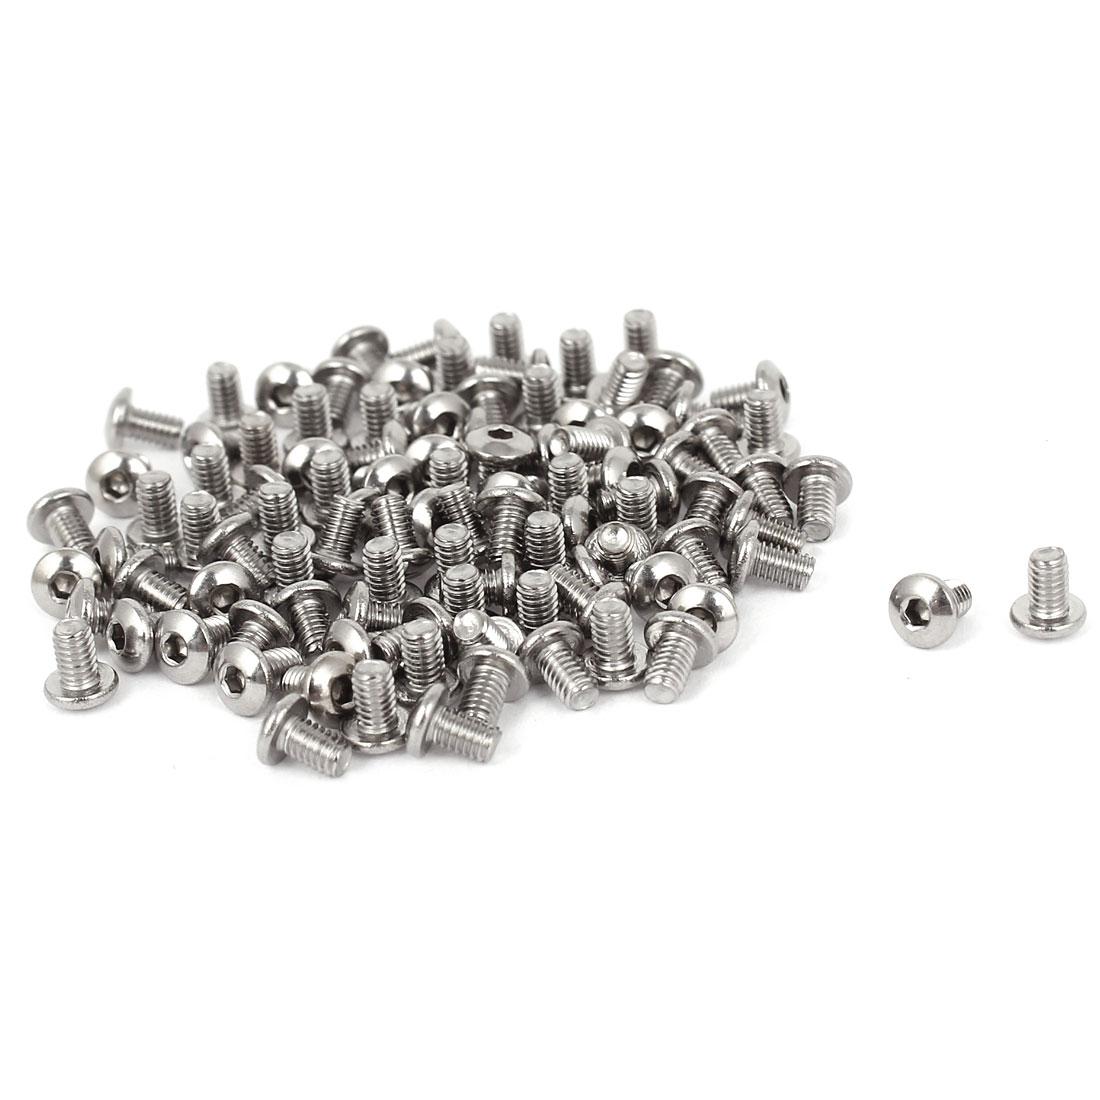 100 Pcs M2.5x4mm Stainless Steel Hex Button Head Bolts Machine Screws 5mm Long